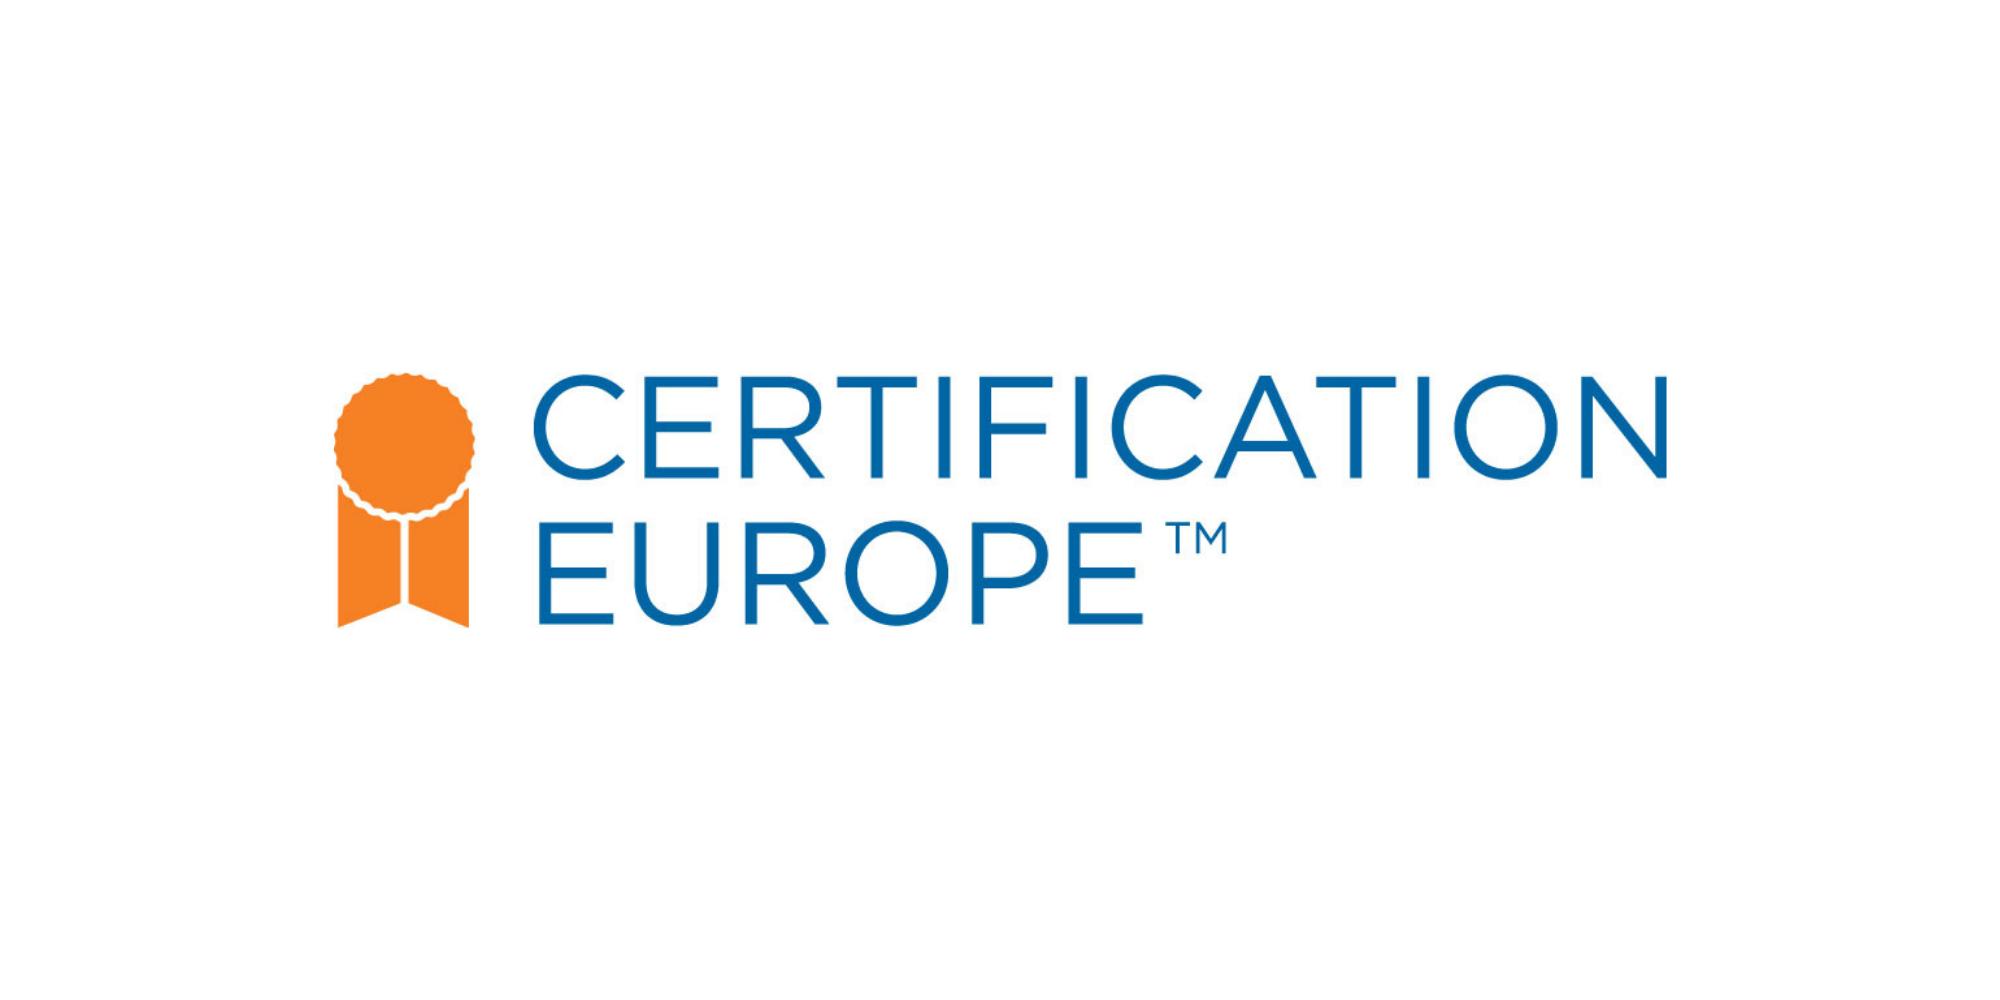 Certification Europe logo